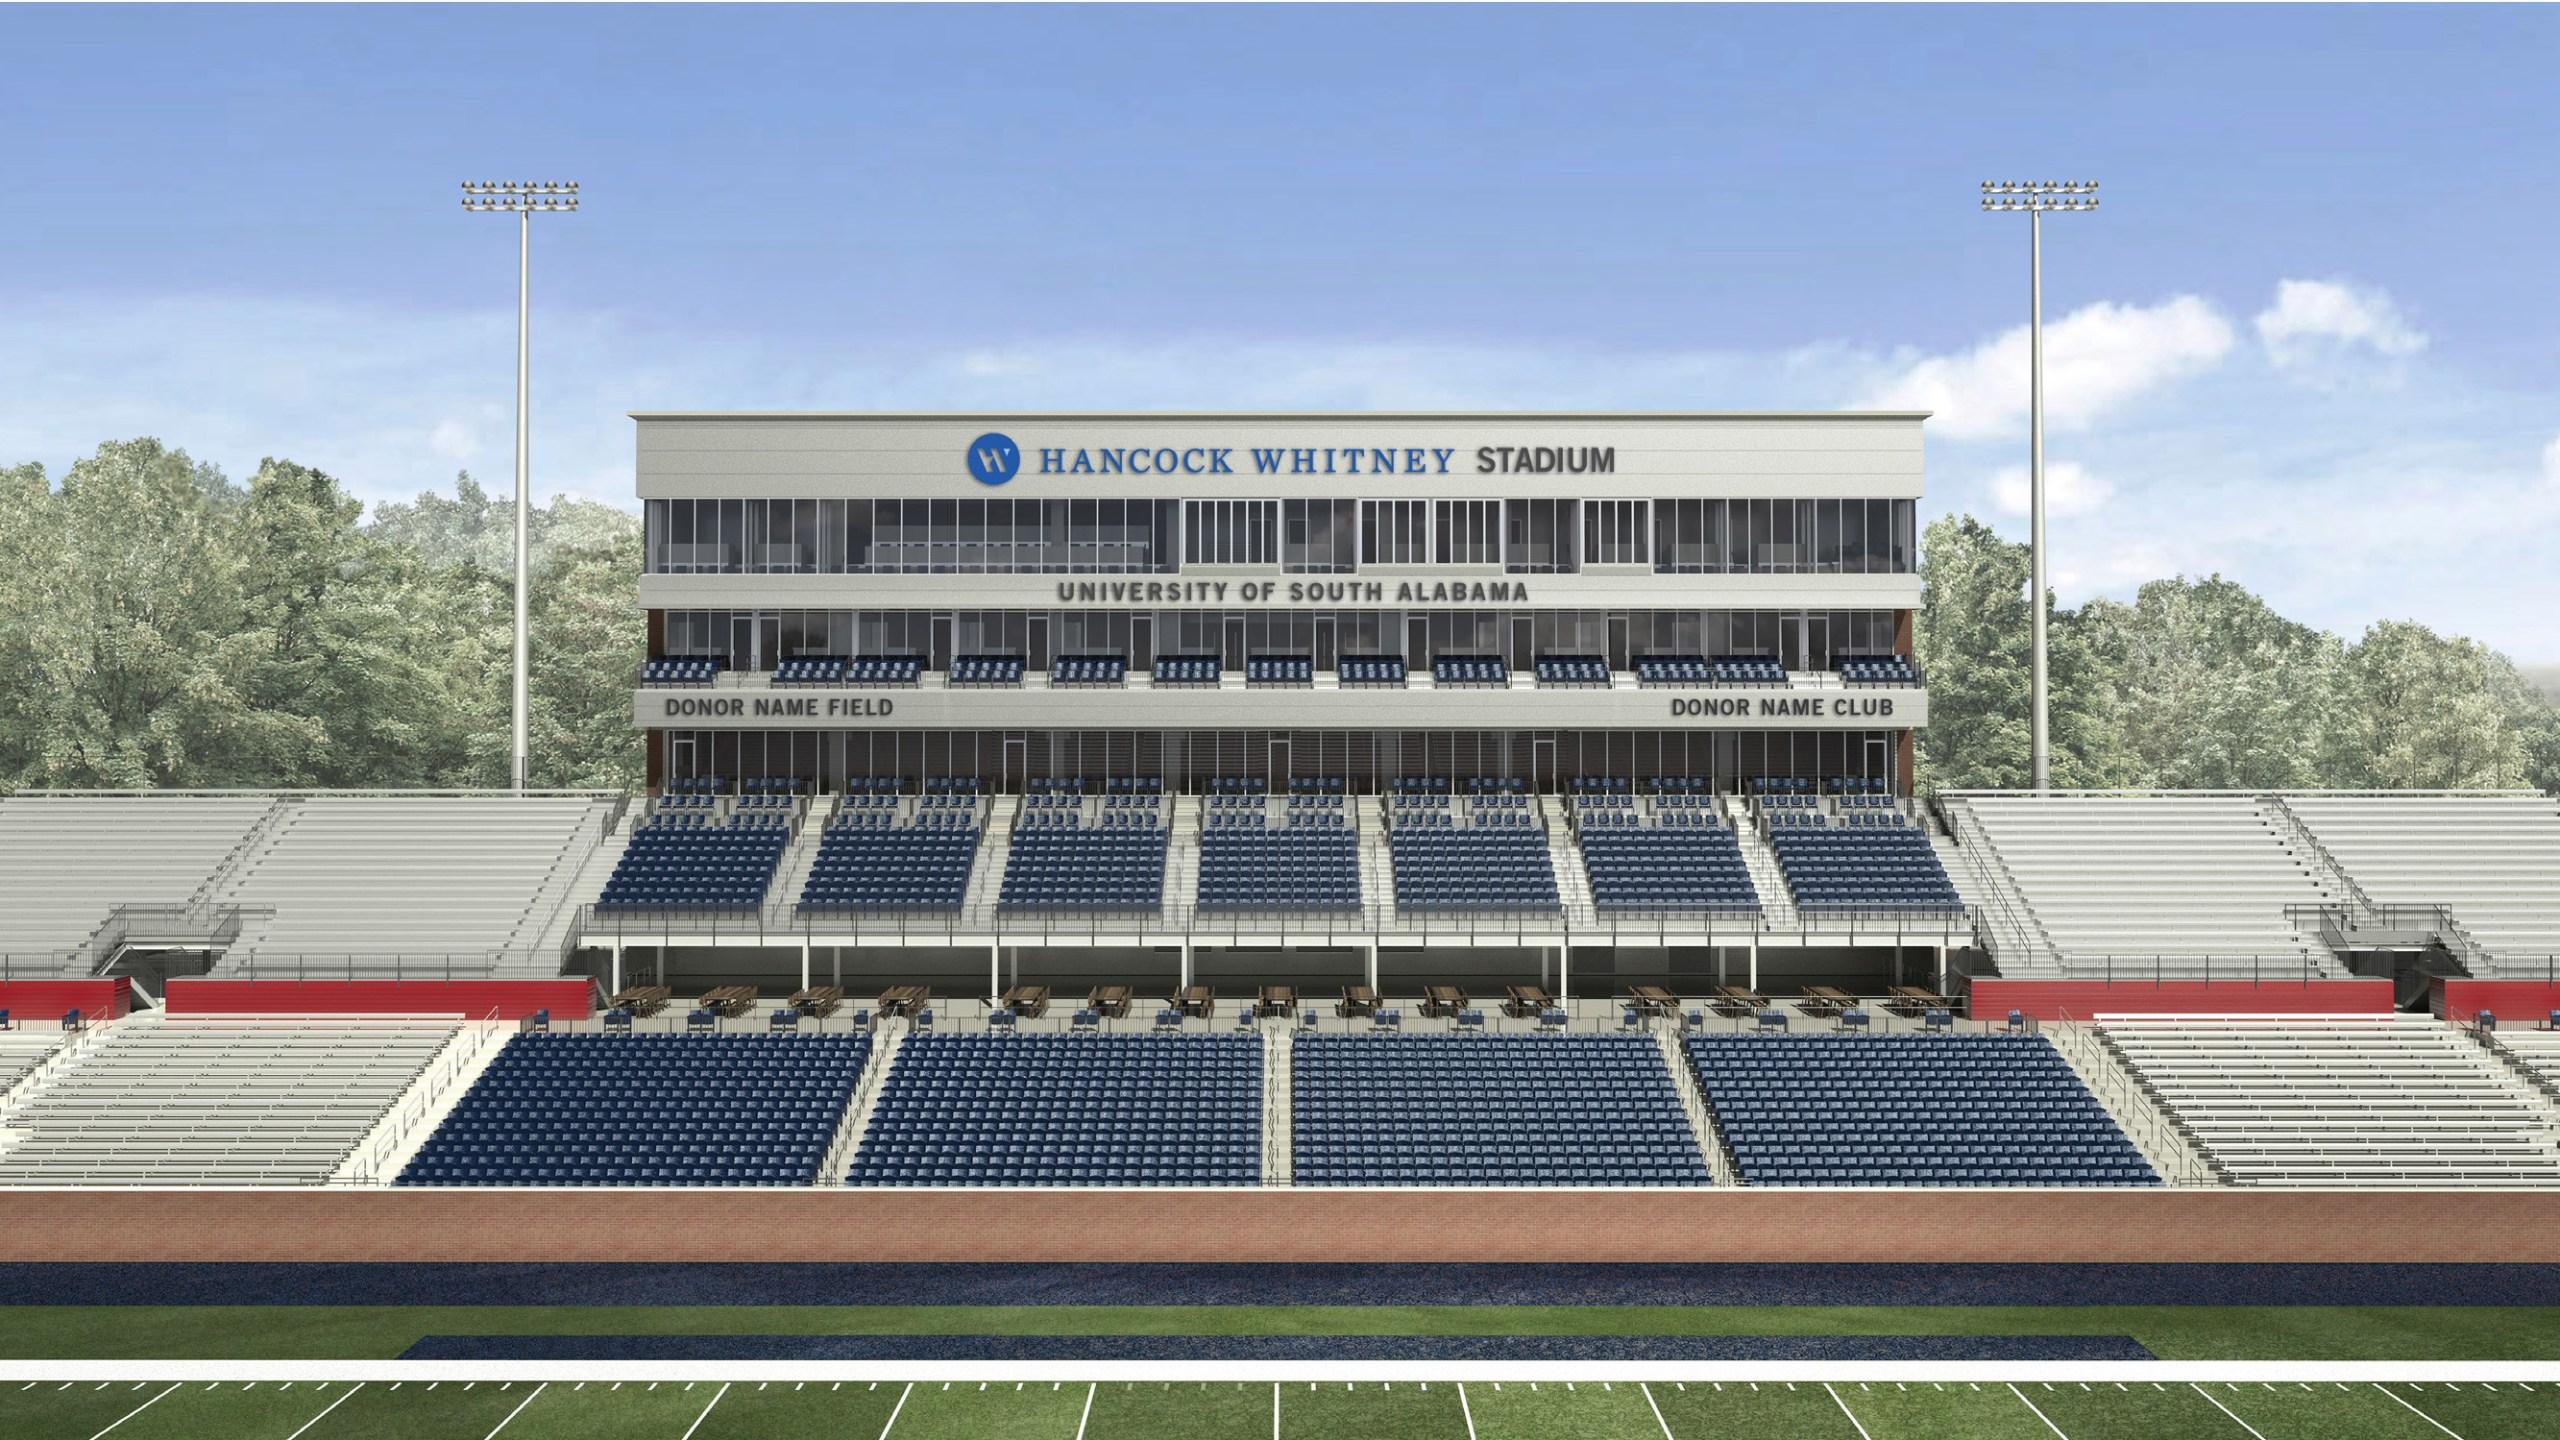 Stadium_PressBox_1547575037658.jpg